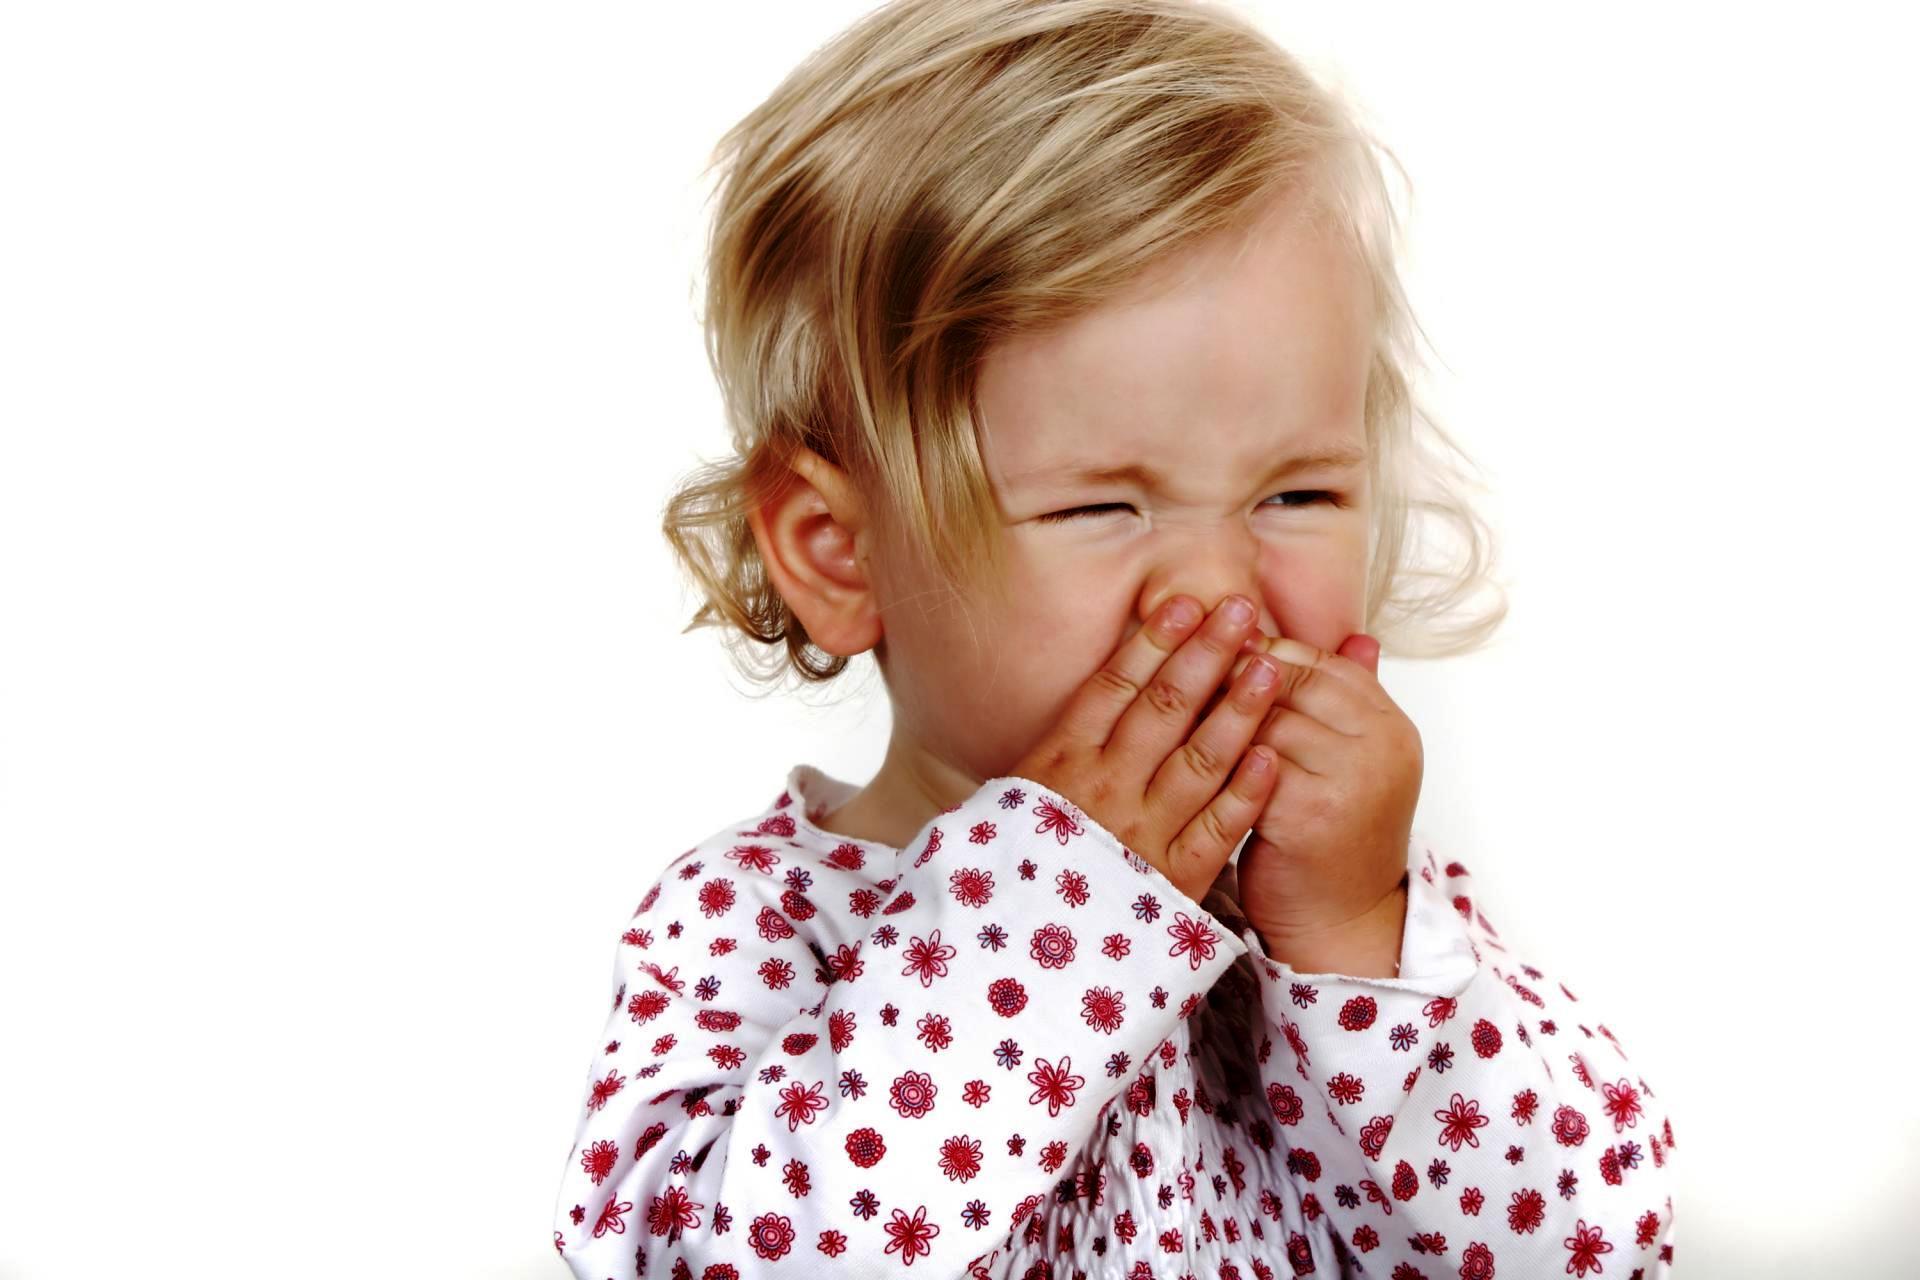 Тета хилинг — лечение аллергии у ребенка